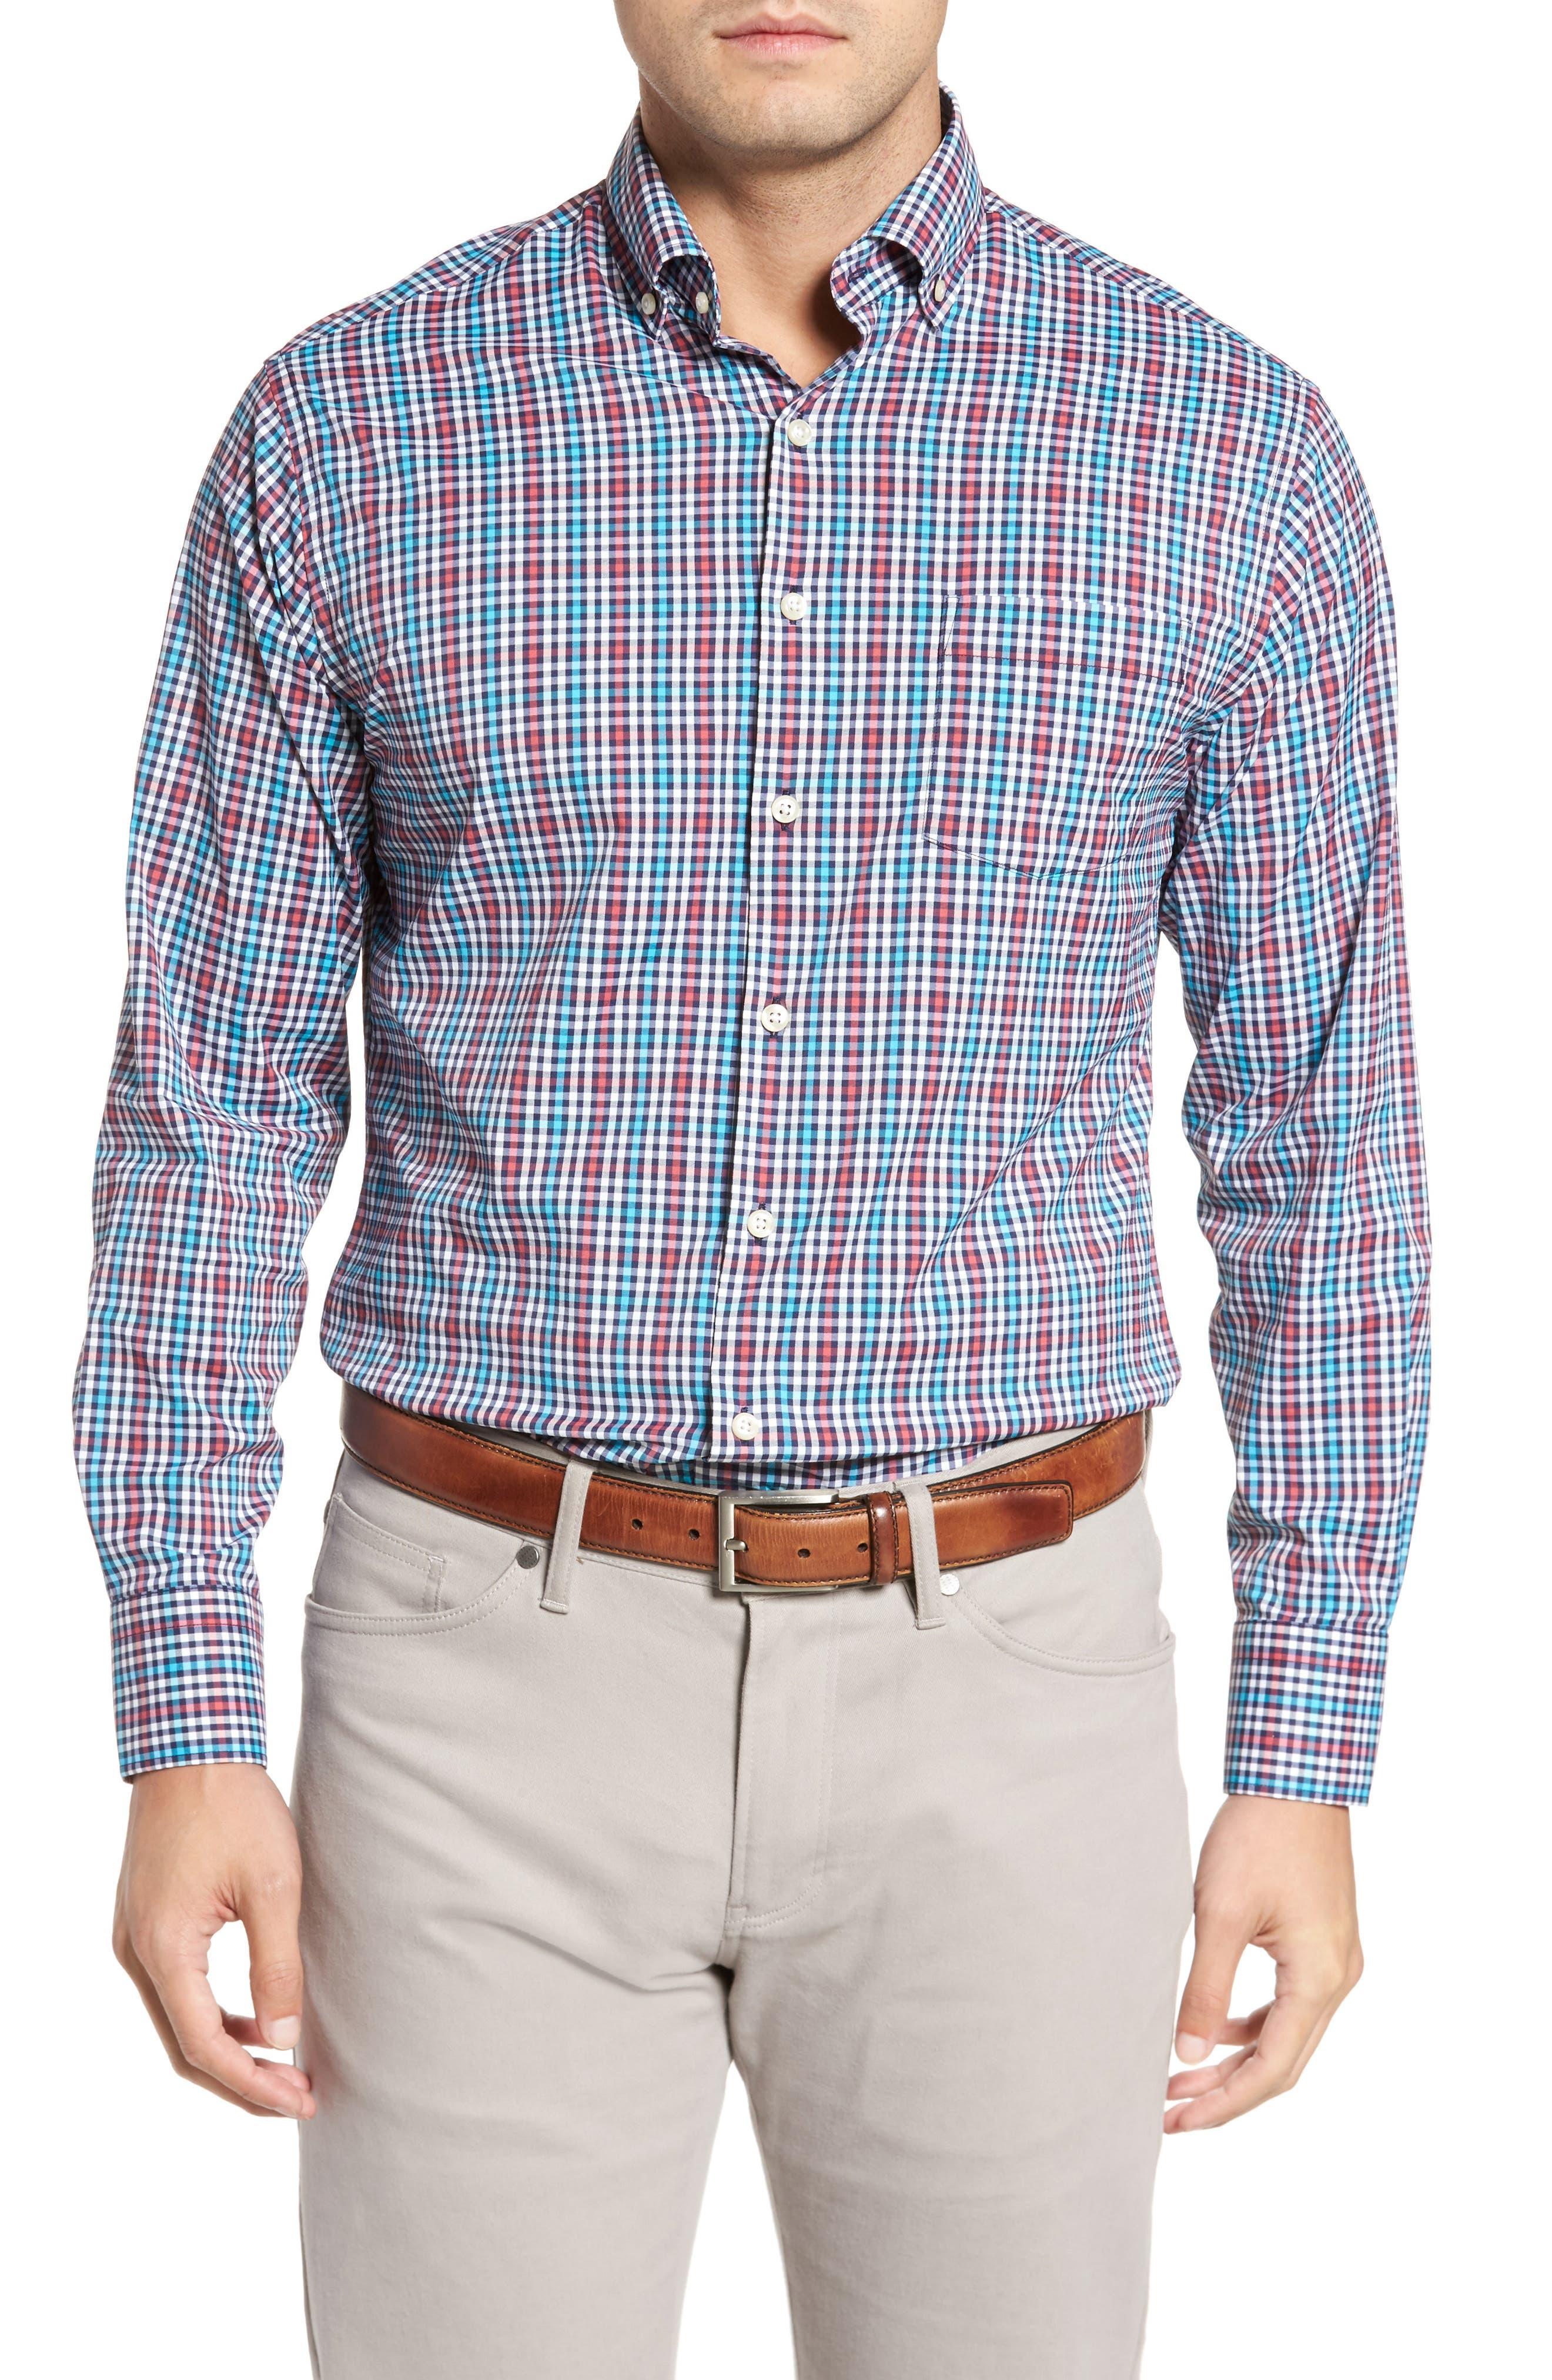 Alternate Image 1 Selected - Peter Millar Collier Regular Fit Plaid Performance Sport Shirt